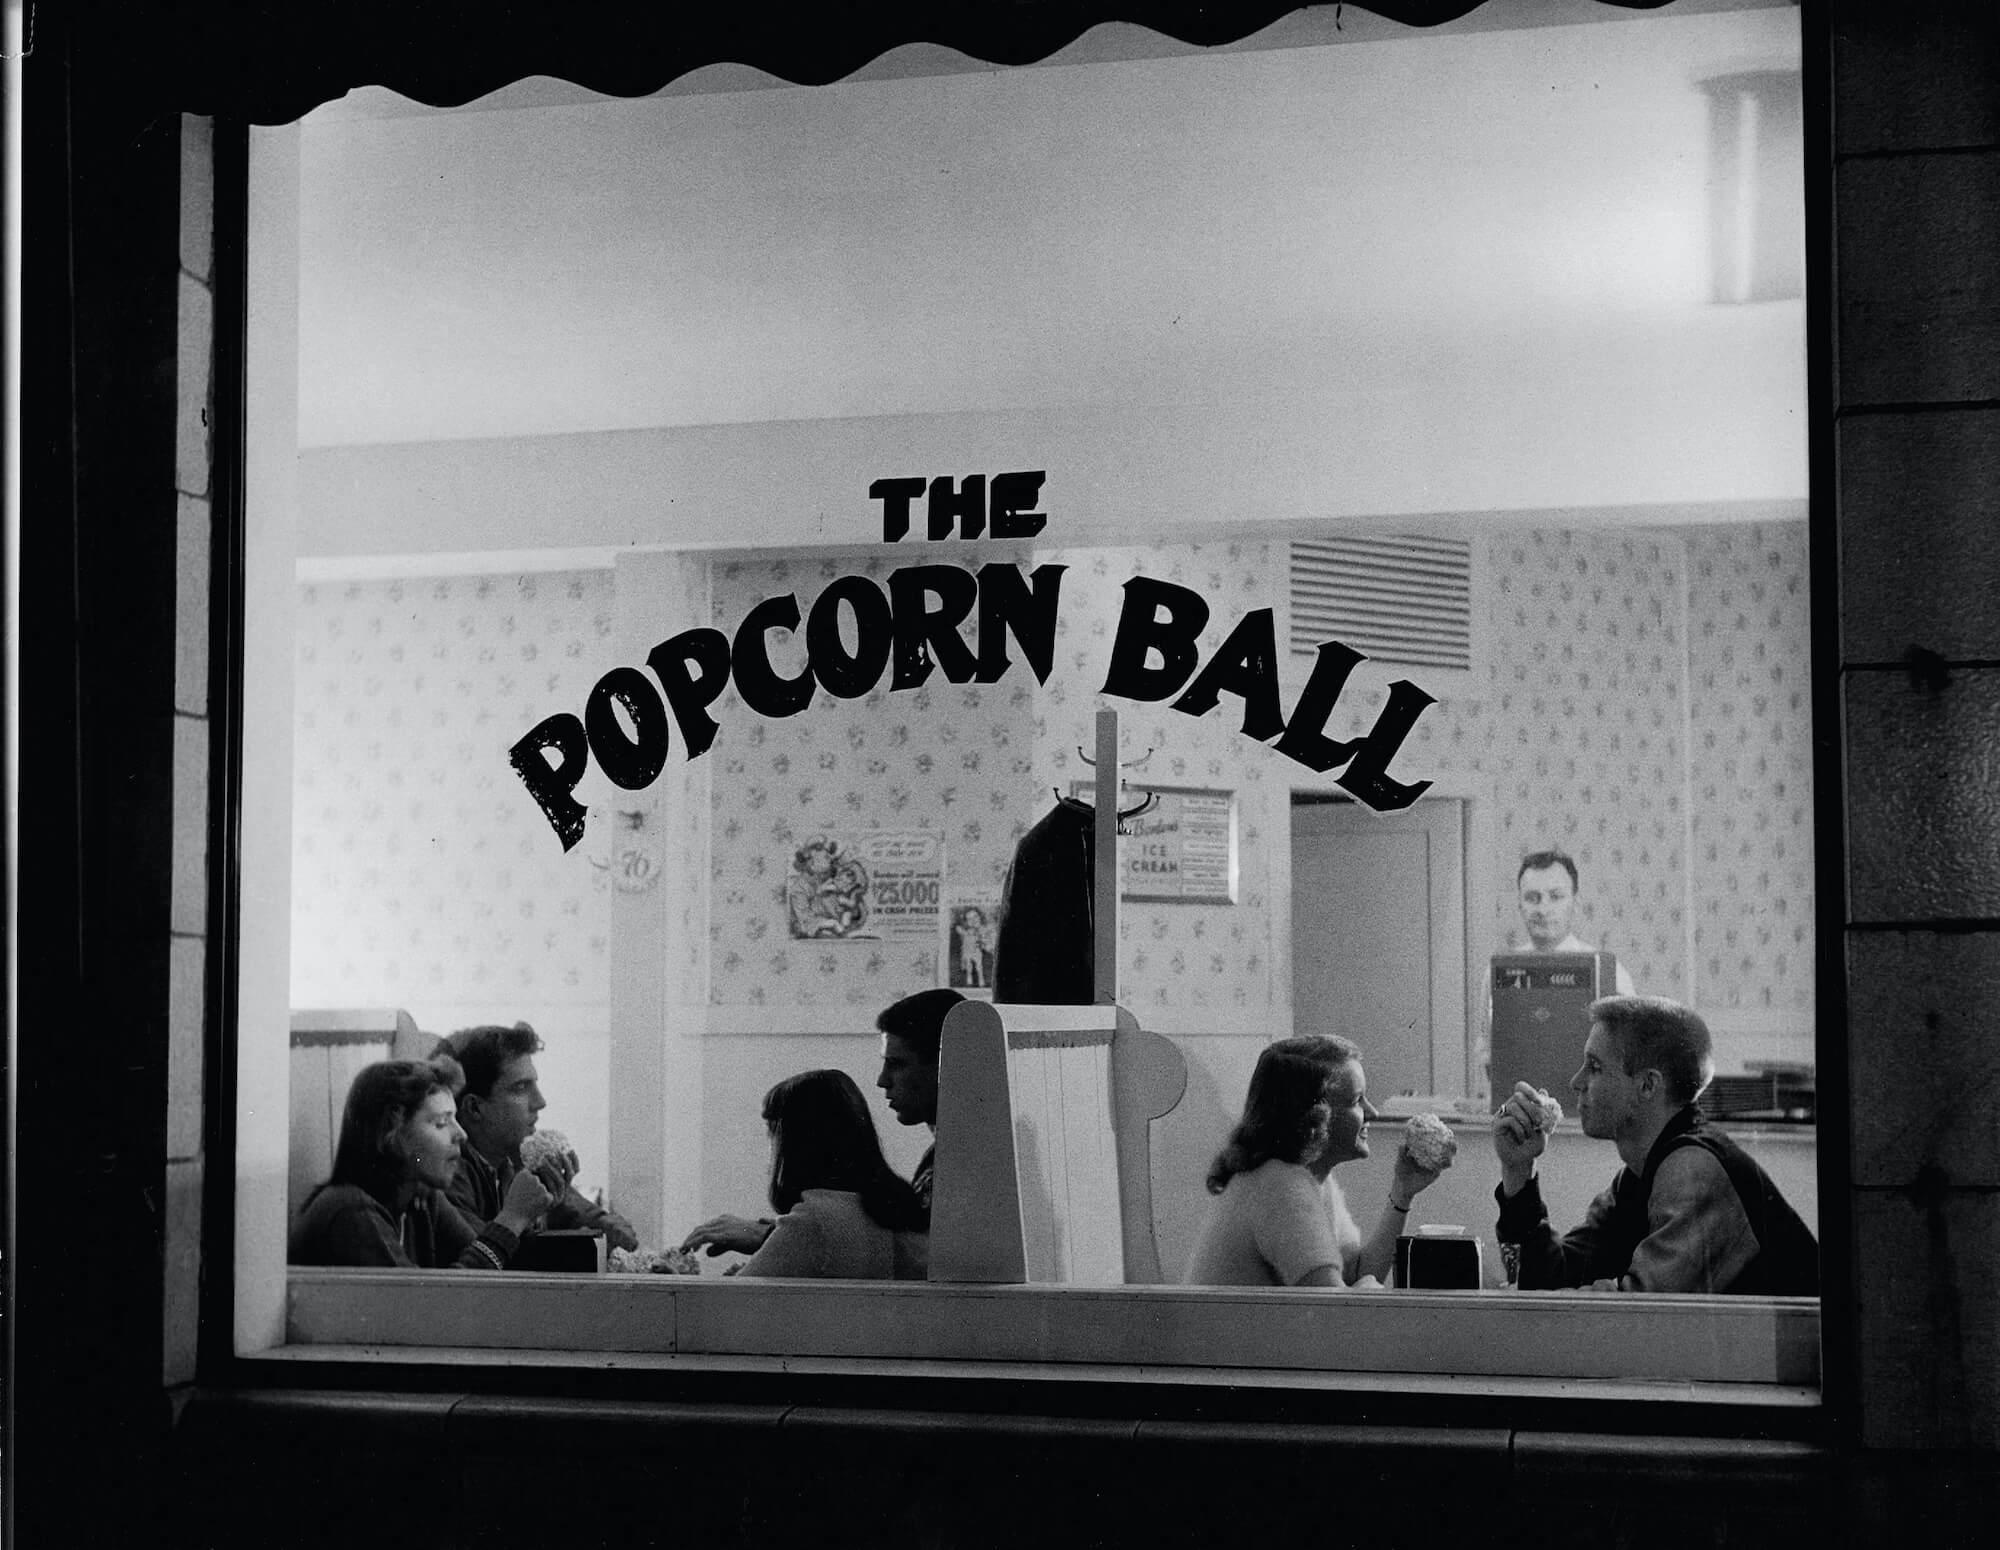 The Popcorn Ball, 1940s